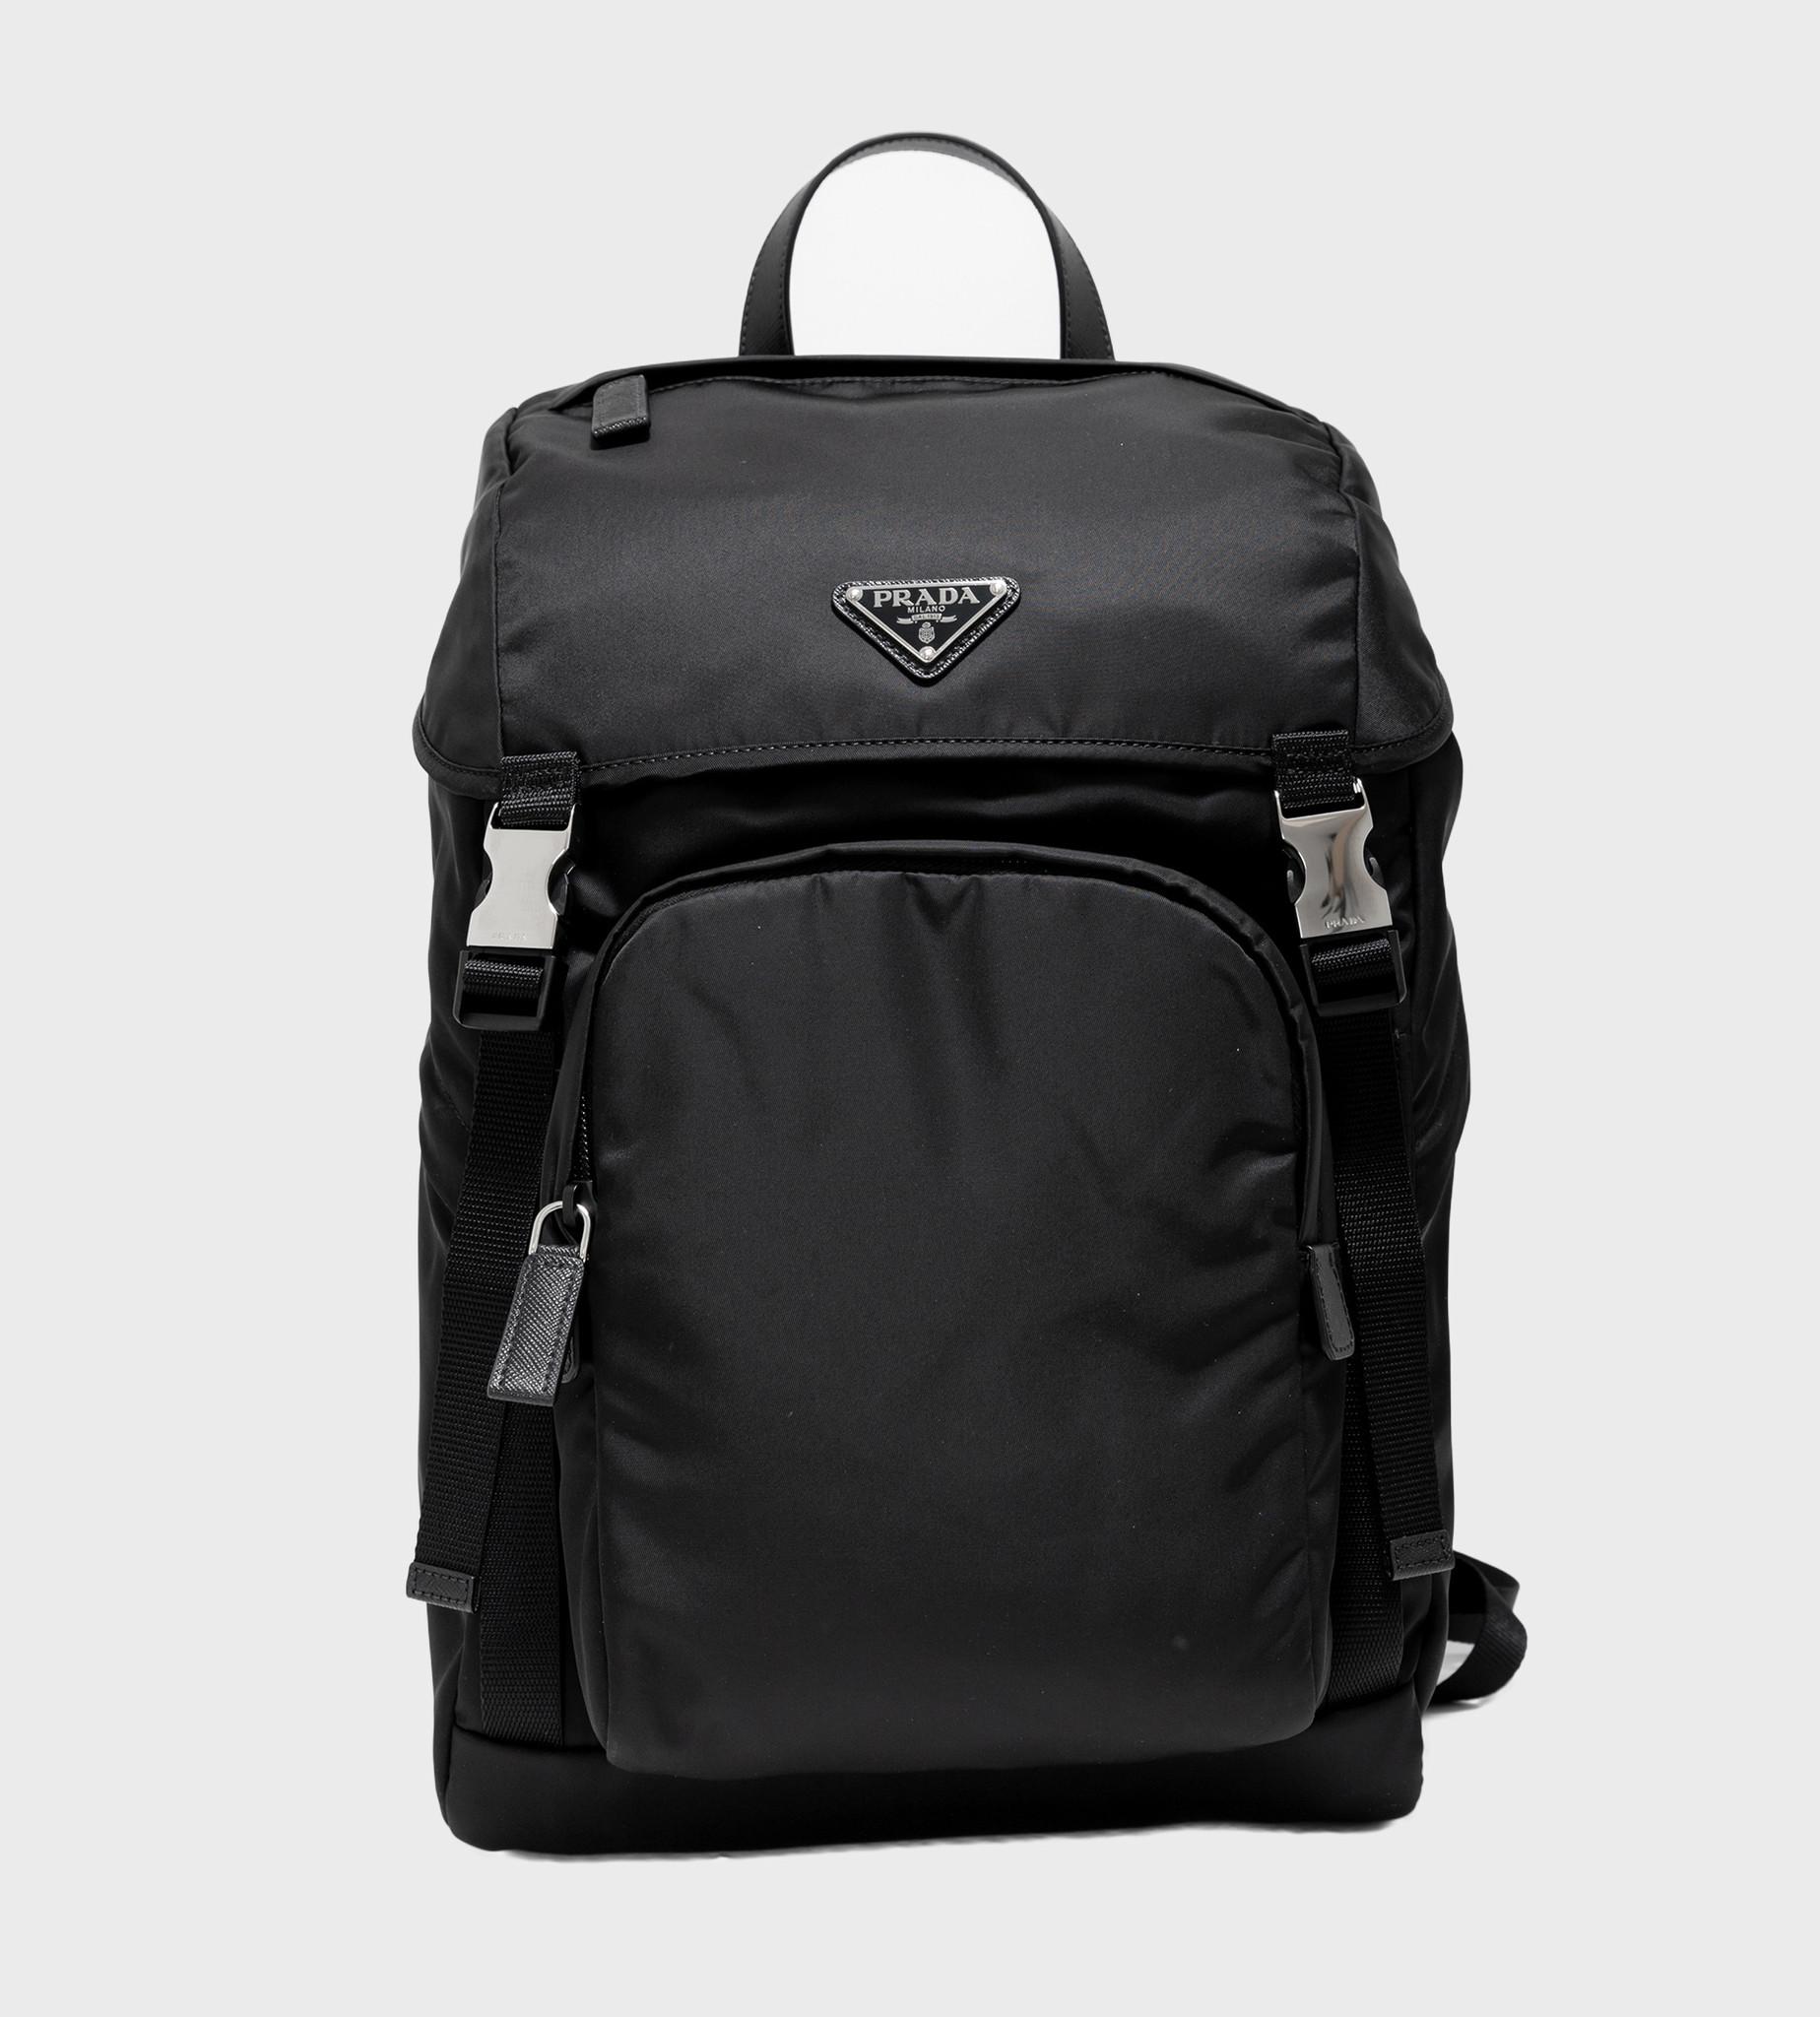 PRADA Nylon Saffiano Backpack Black